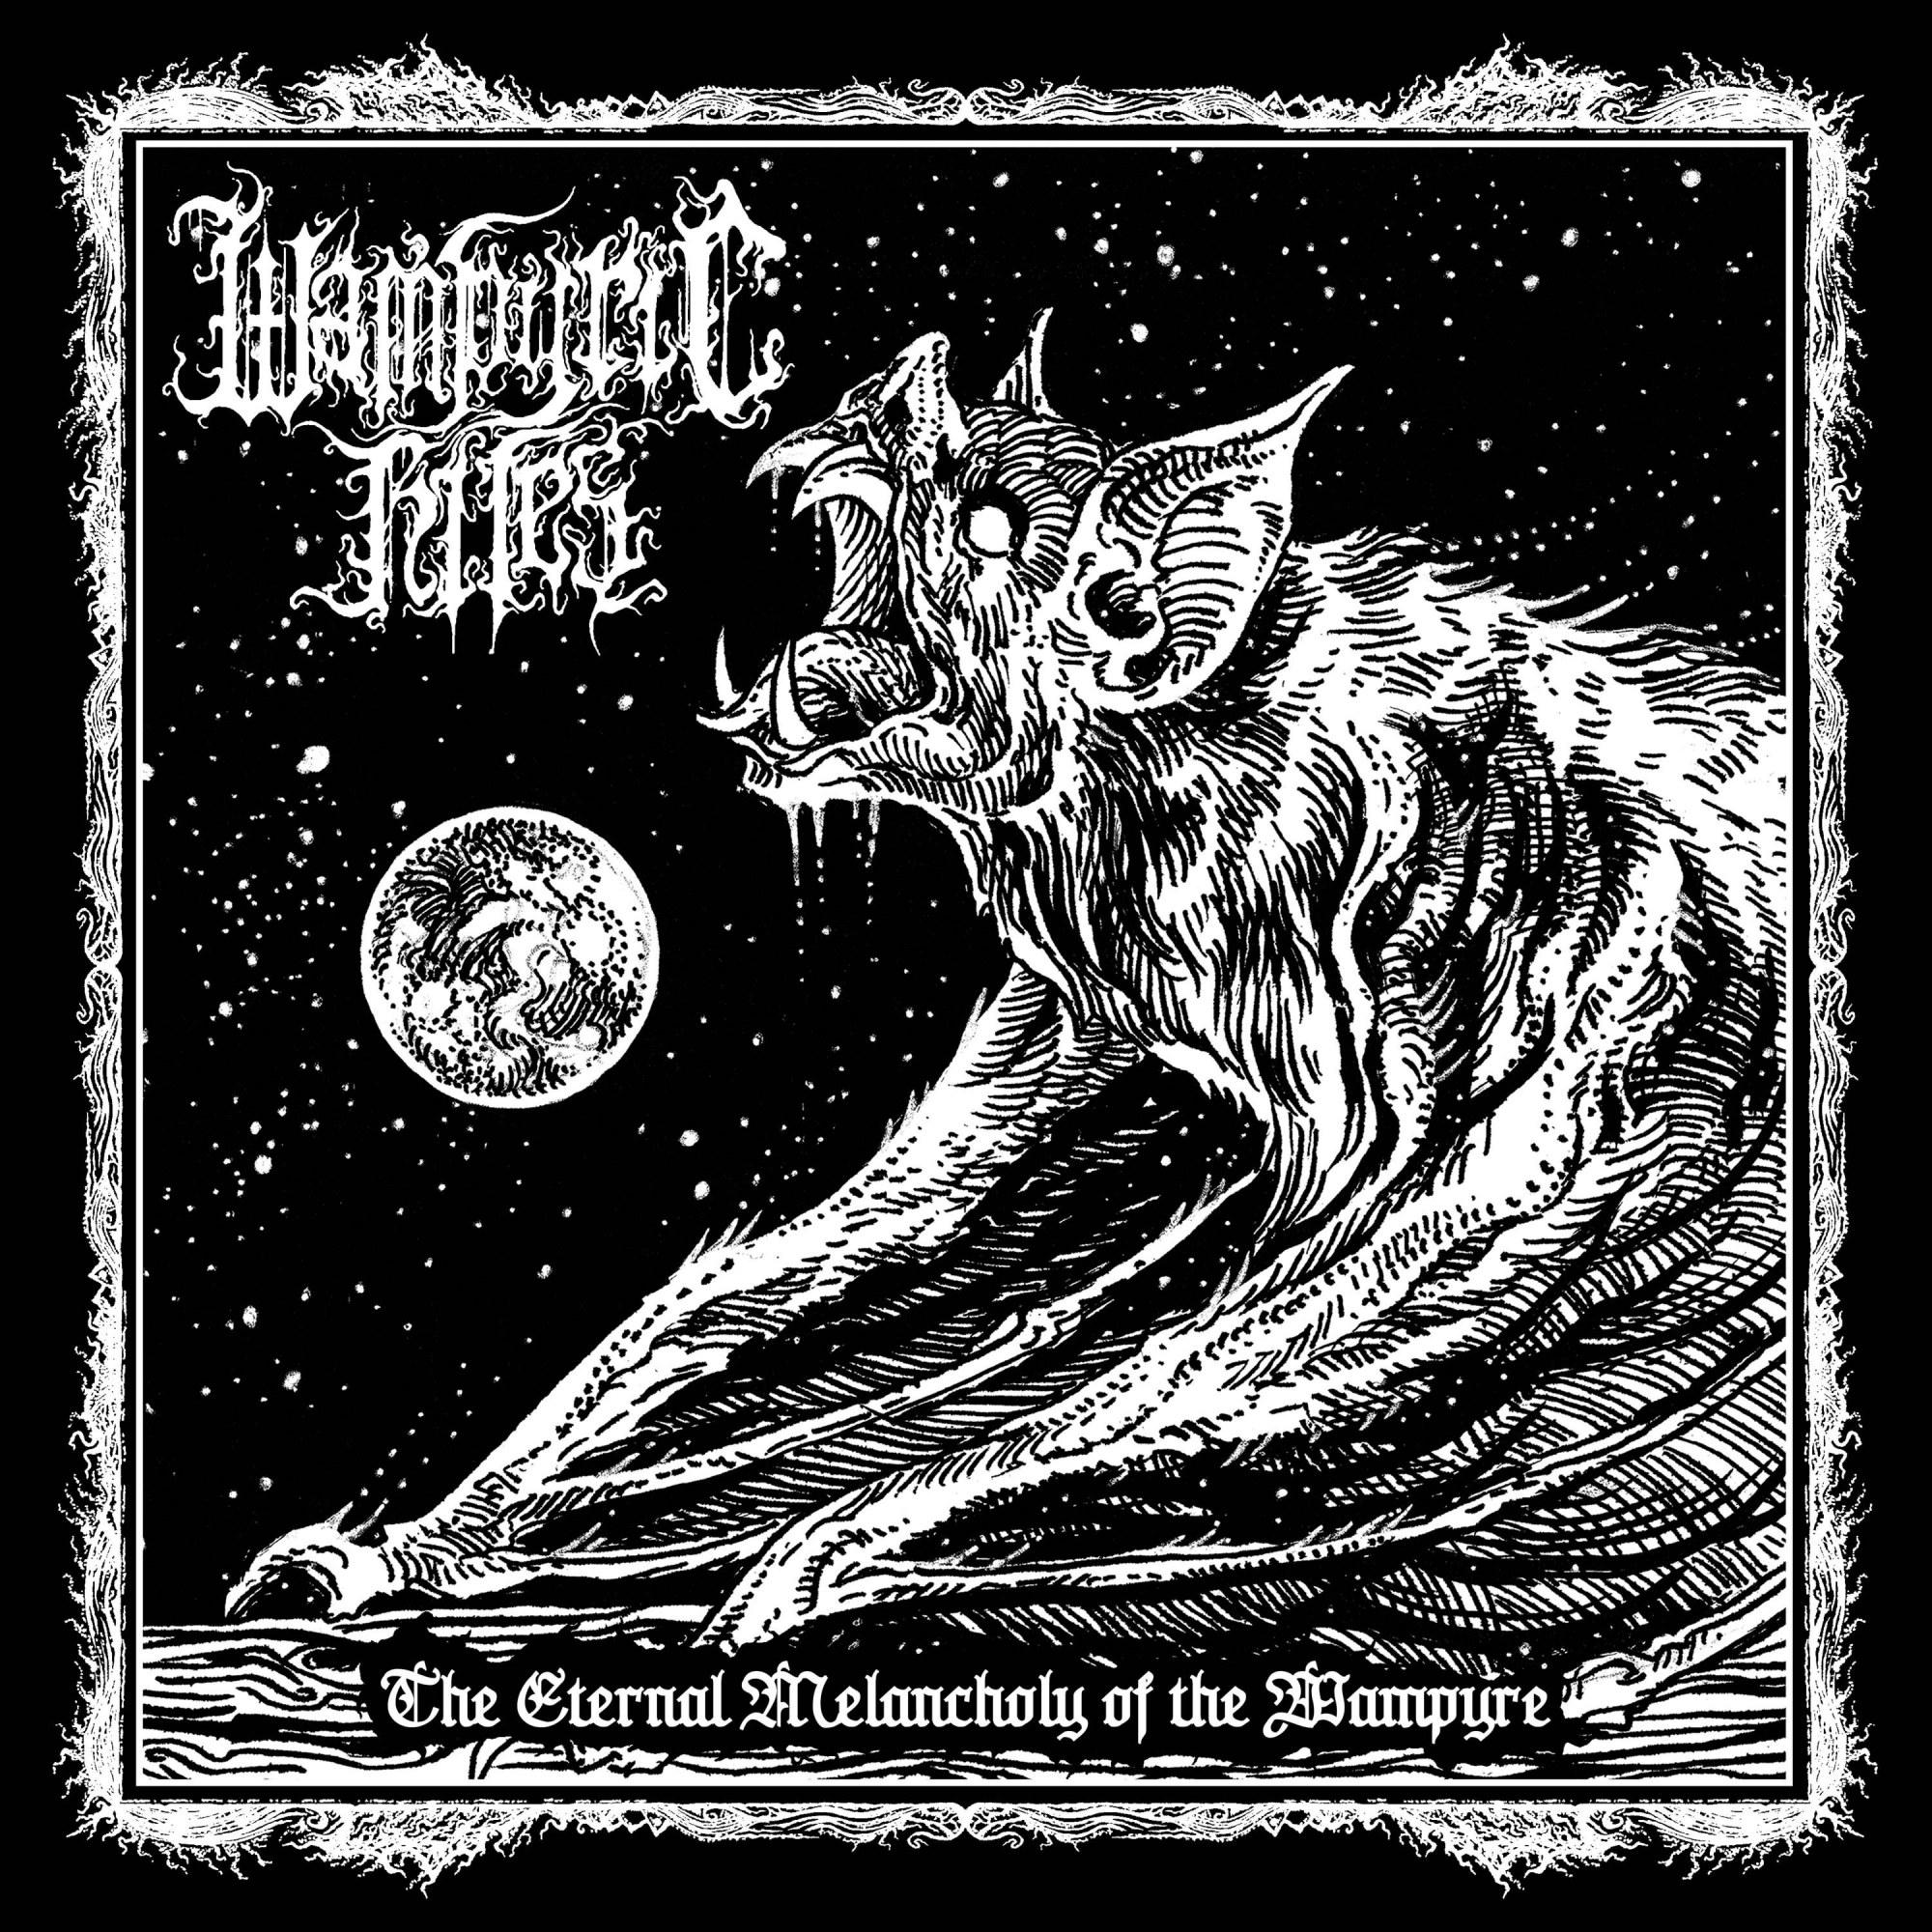 Reviews for Wampyric Rites - The Eternal Melancholy of the Wampyre